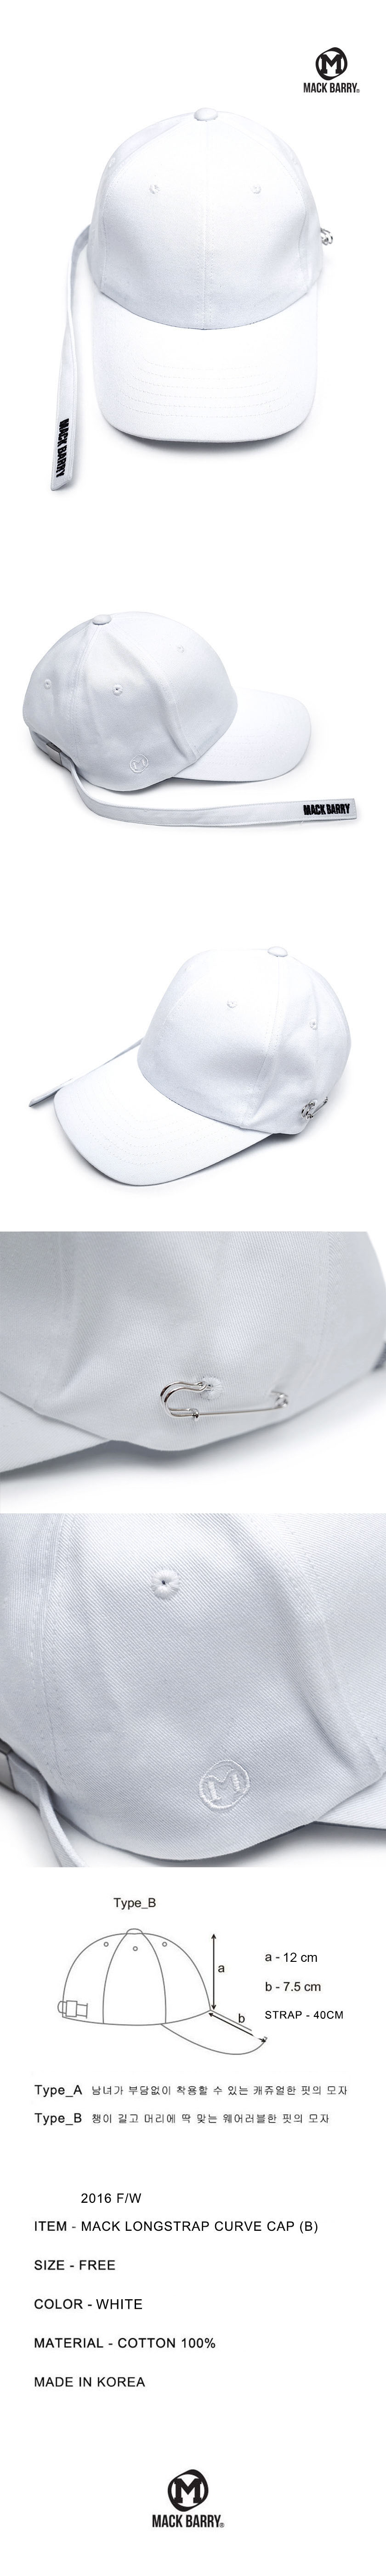 LONGSTRAP CURVE CAP WHITE